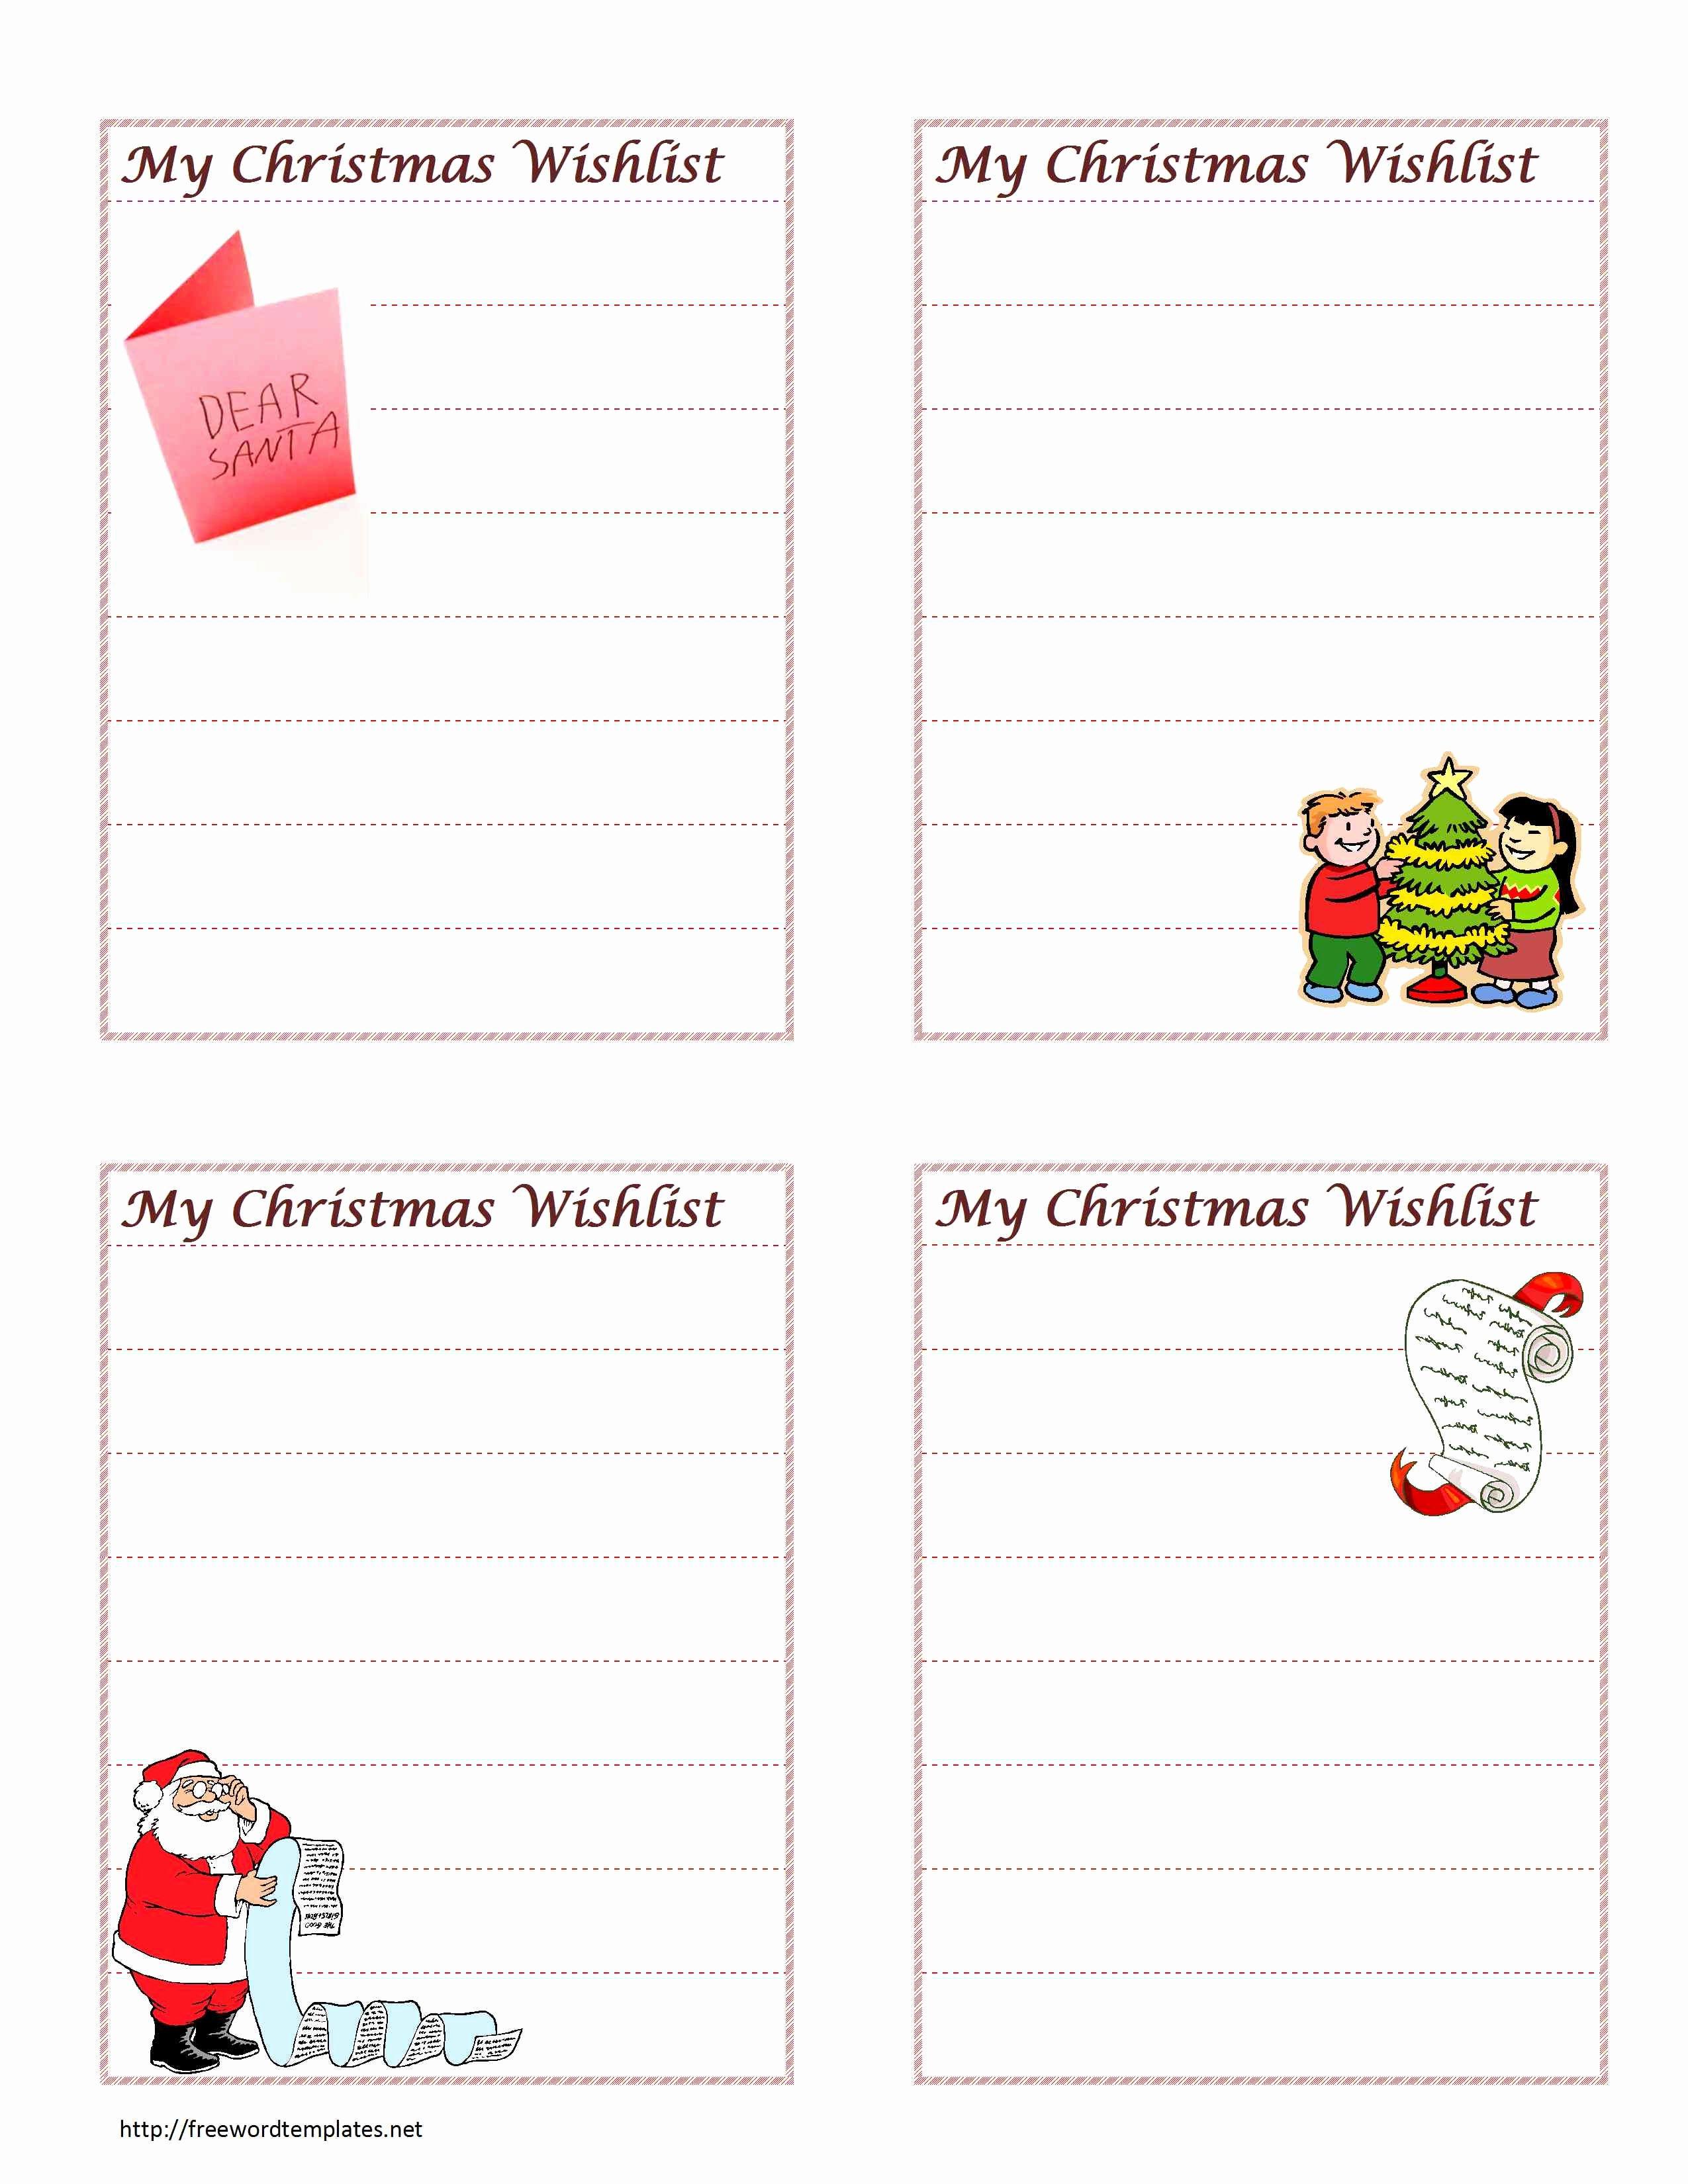 Wish List Template Luxury Christmas Wish List Template